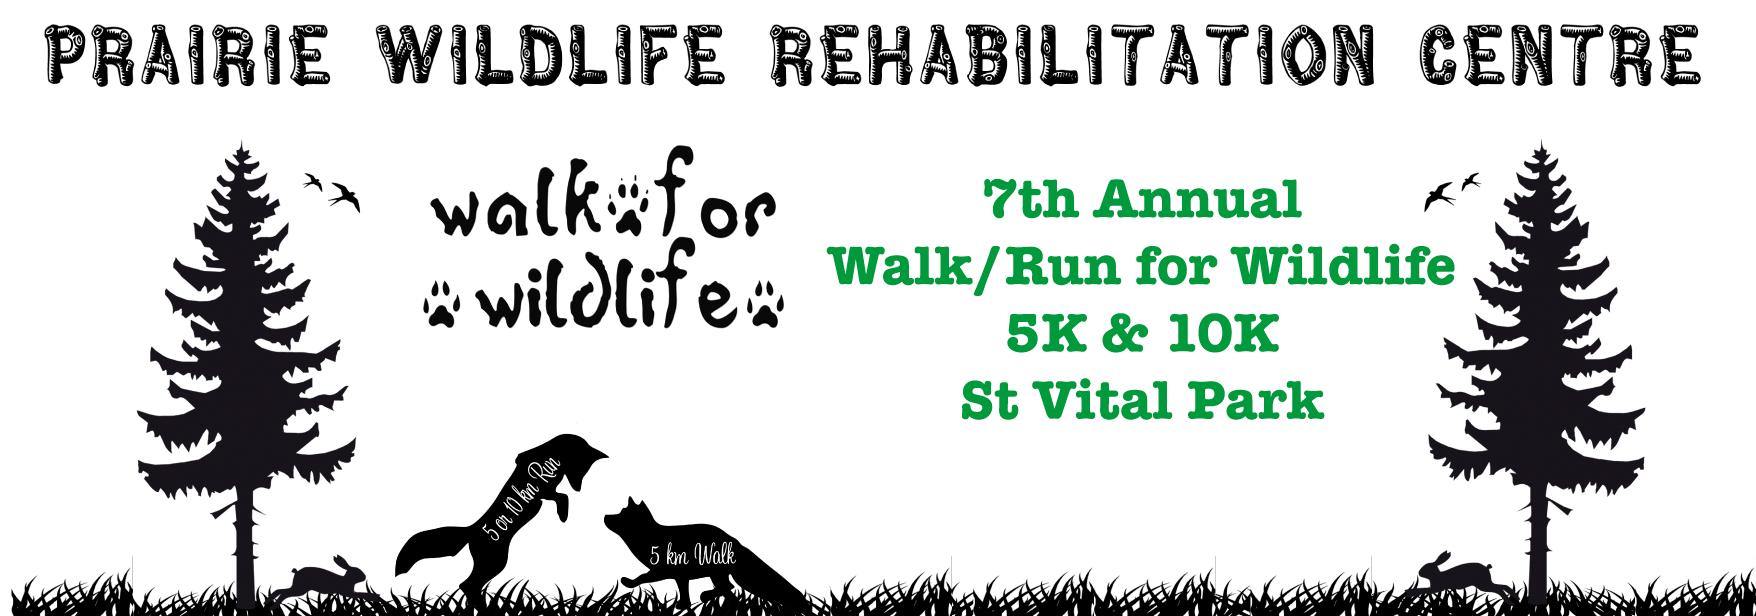 7th Annual Walk/Run for Wildlife